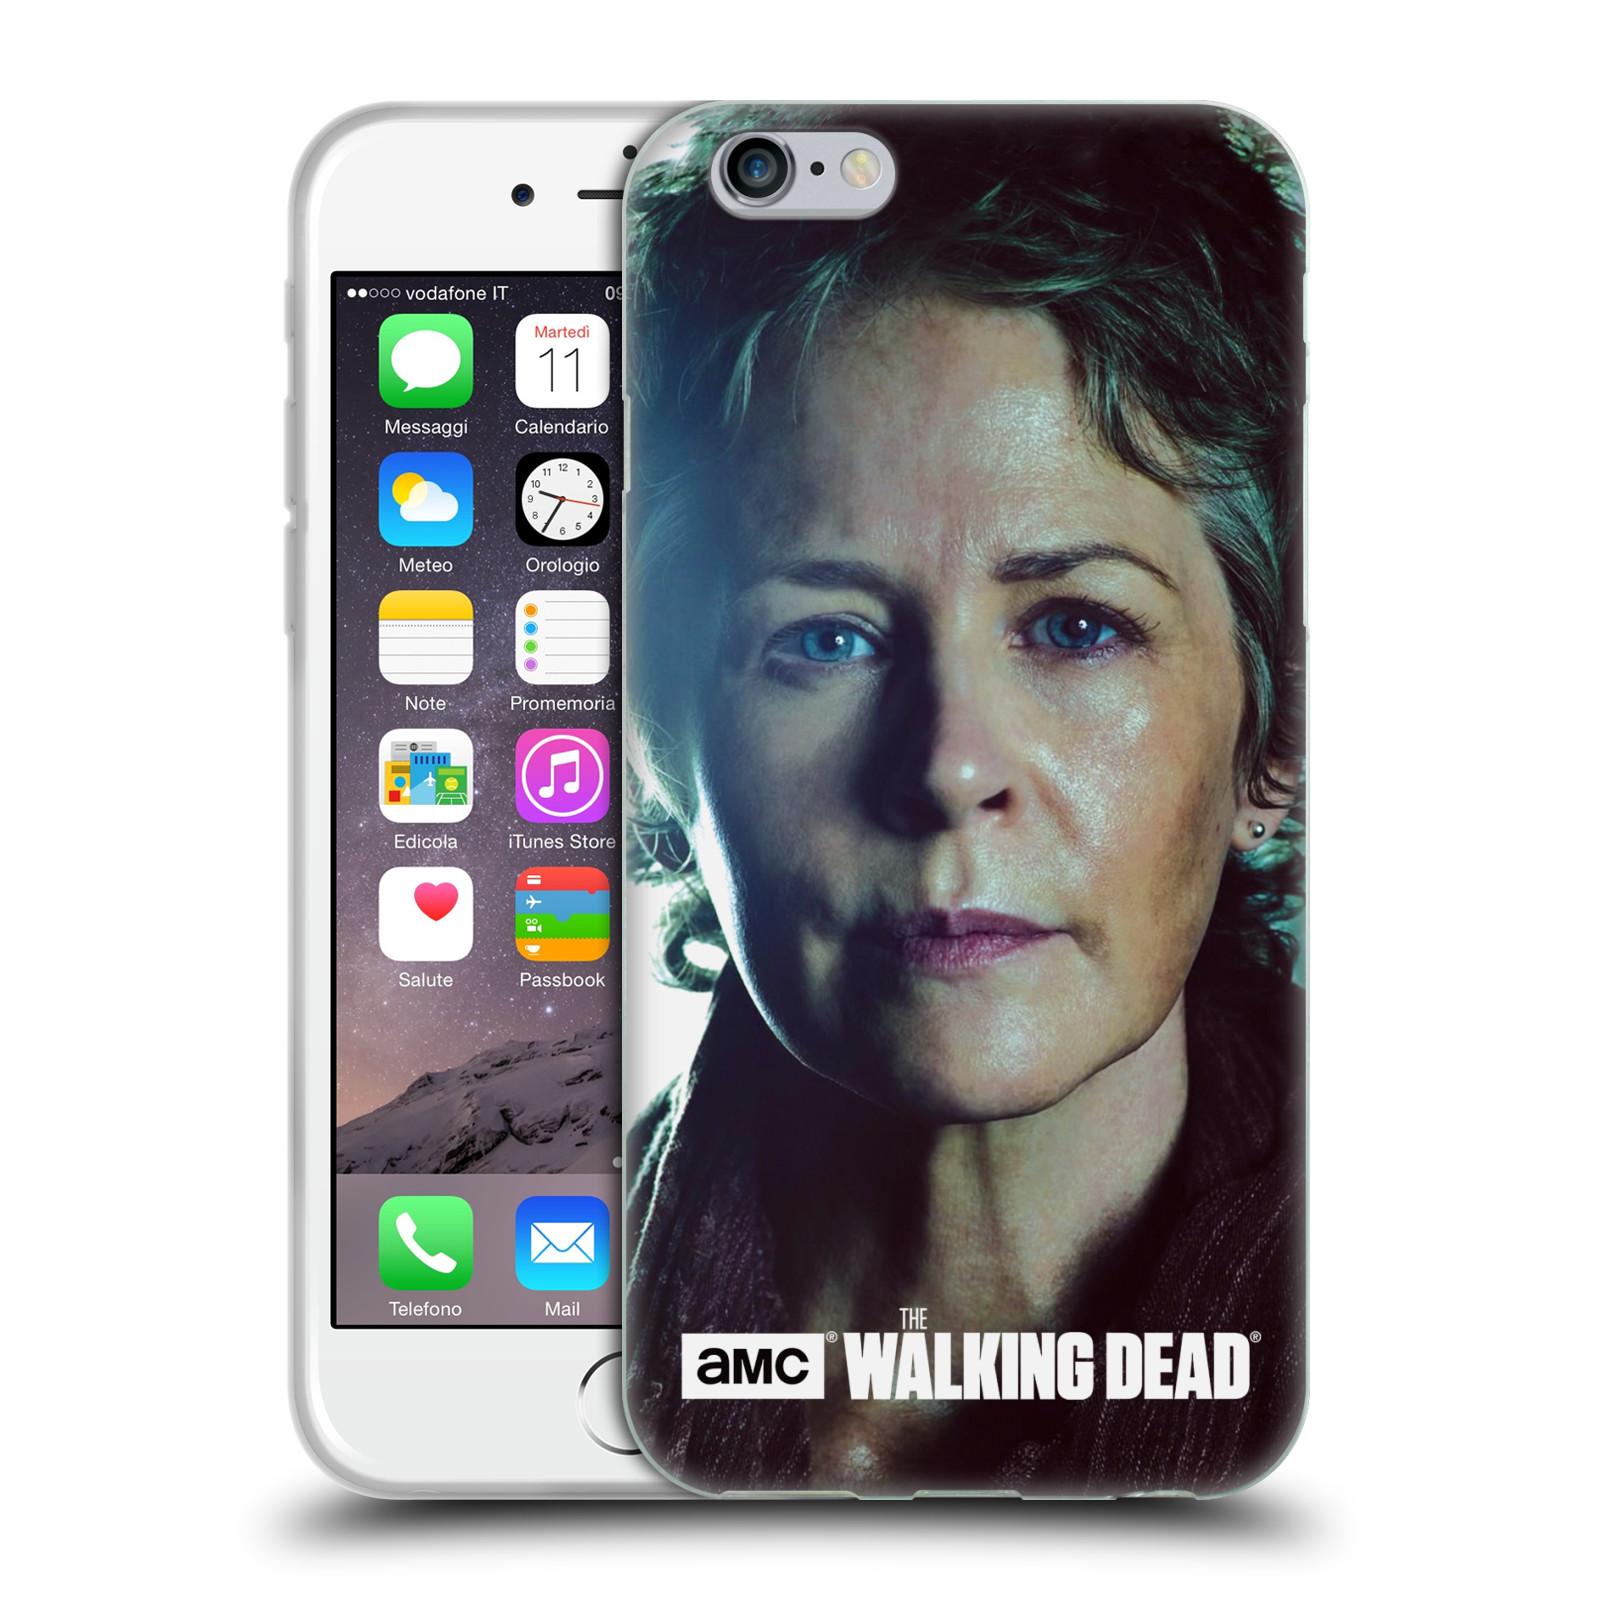 HEAD CASE silikonový obal na mobil Apple Iphone 6 / 6S originální potisk Walking Dead postavy CAROL